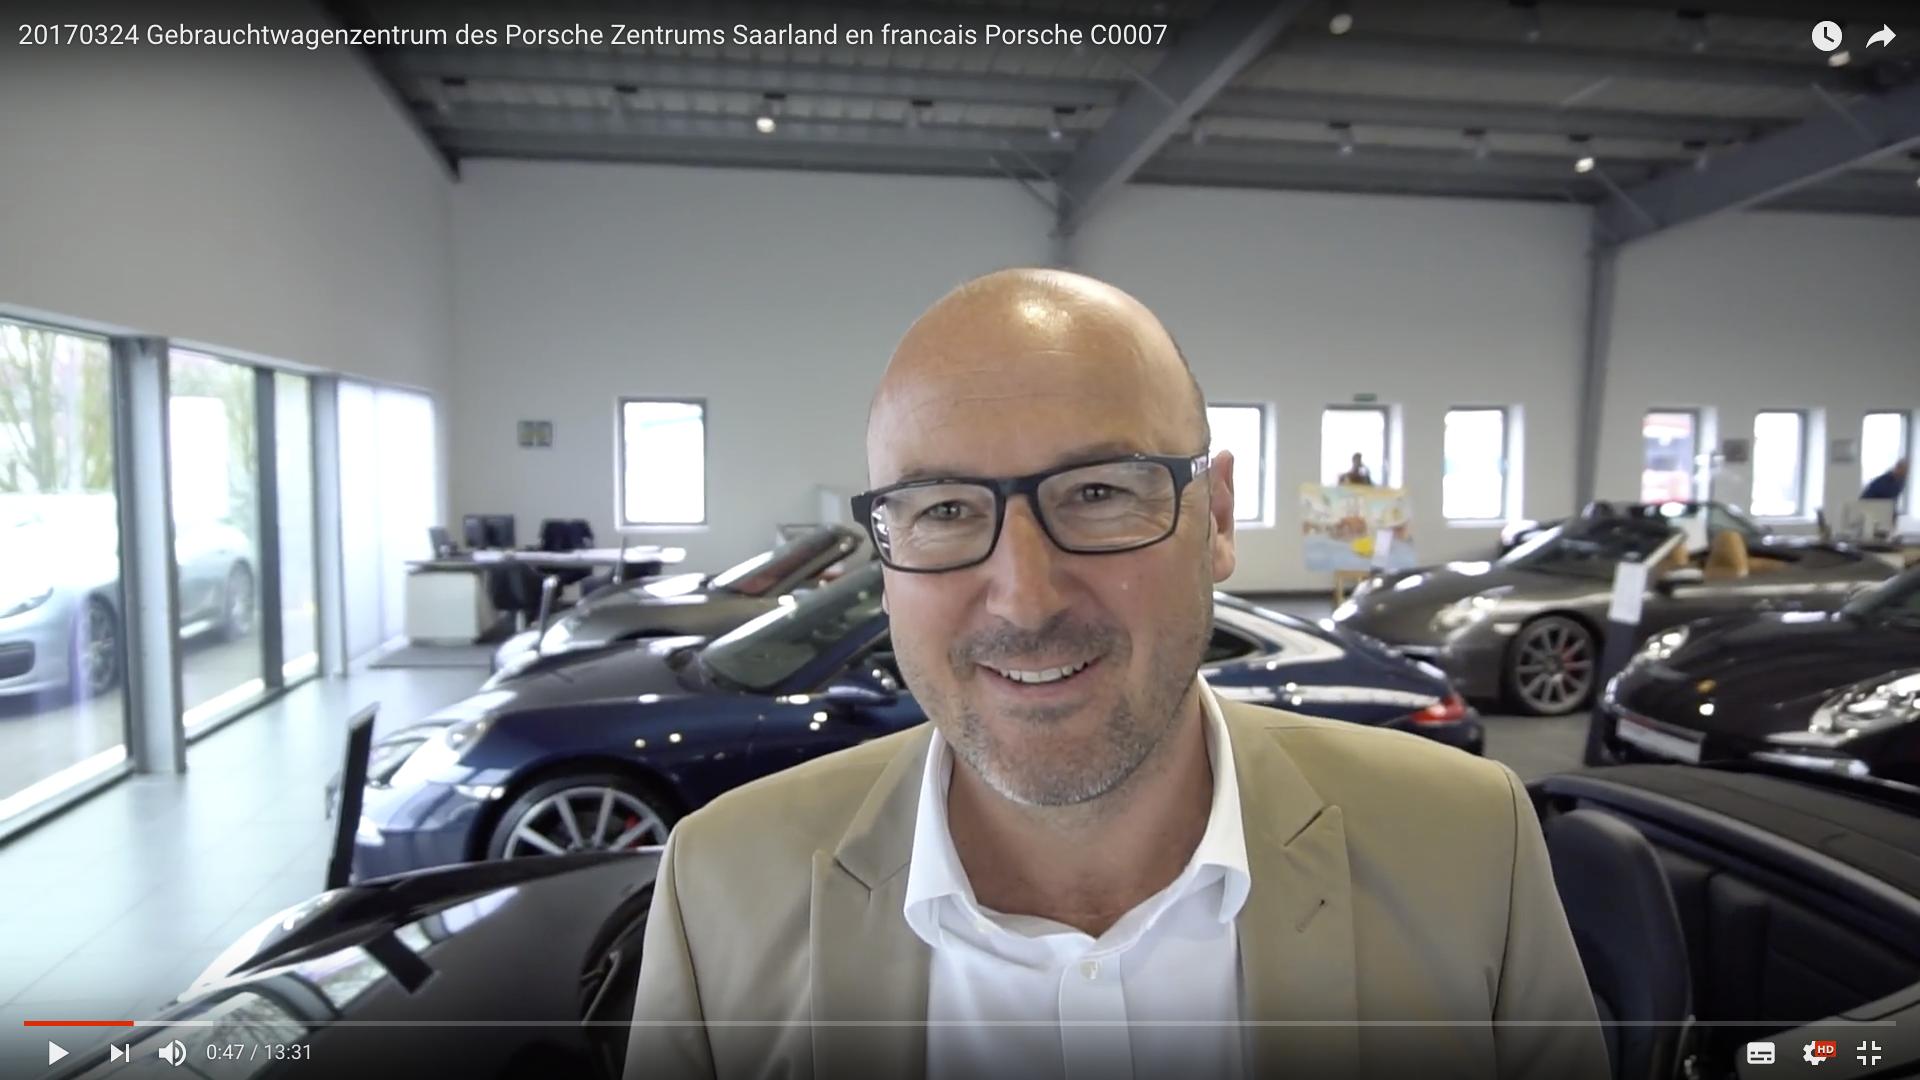 2017 Gebrauchtwagenzentrum des Porsche Zentrums Saarland Alexander Lang _MSM_MEDIEN_SAAR_MOSEL_SAARLAND_FERNSEHEN_1_ED_SAAR